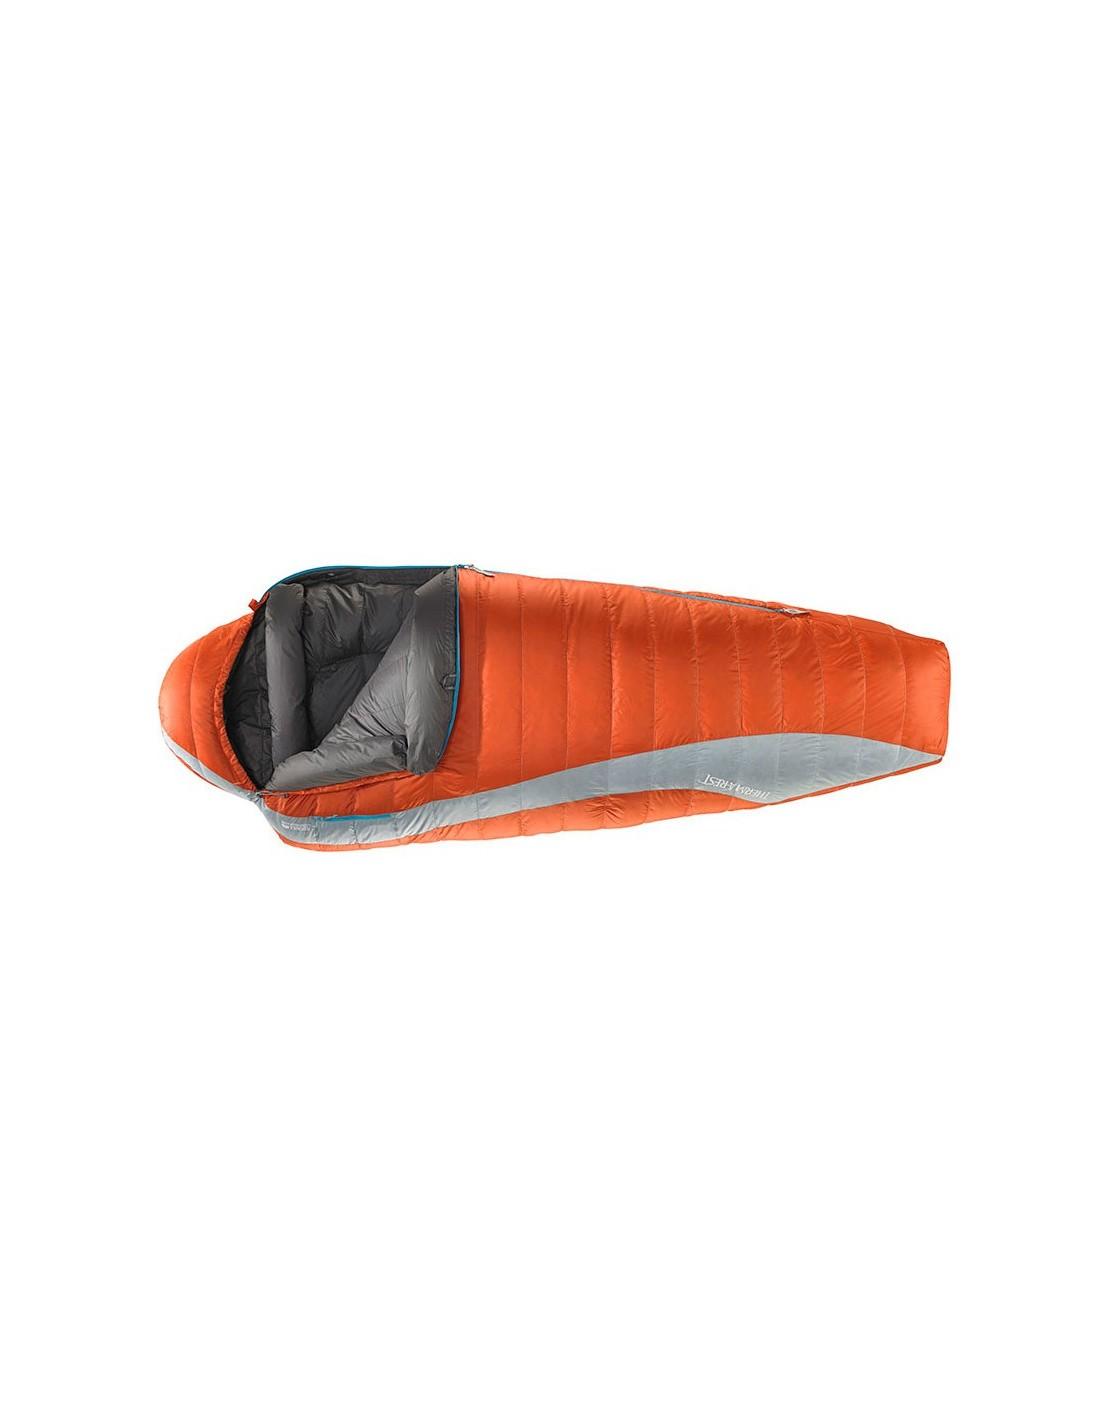 Therm-a-Rest Schlafsack Antares HD, Regular - Chili Schlafsackverwendung - Trekk